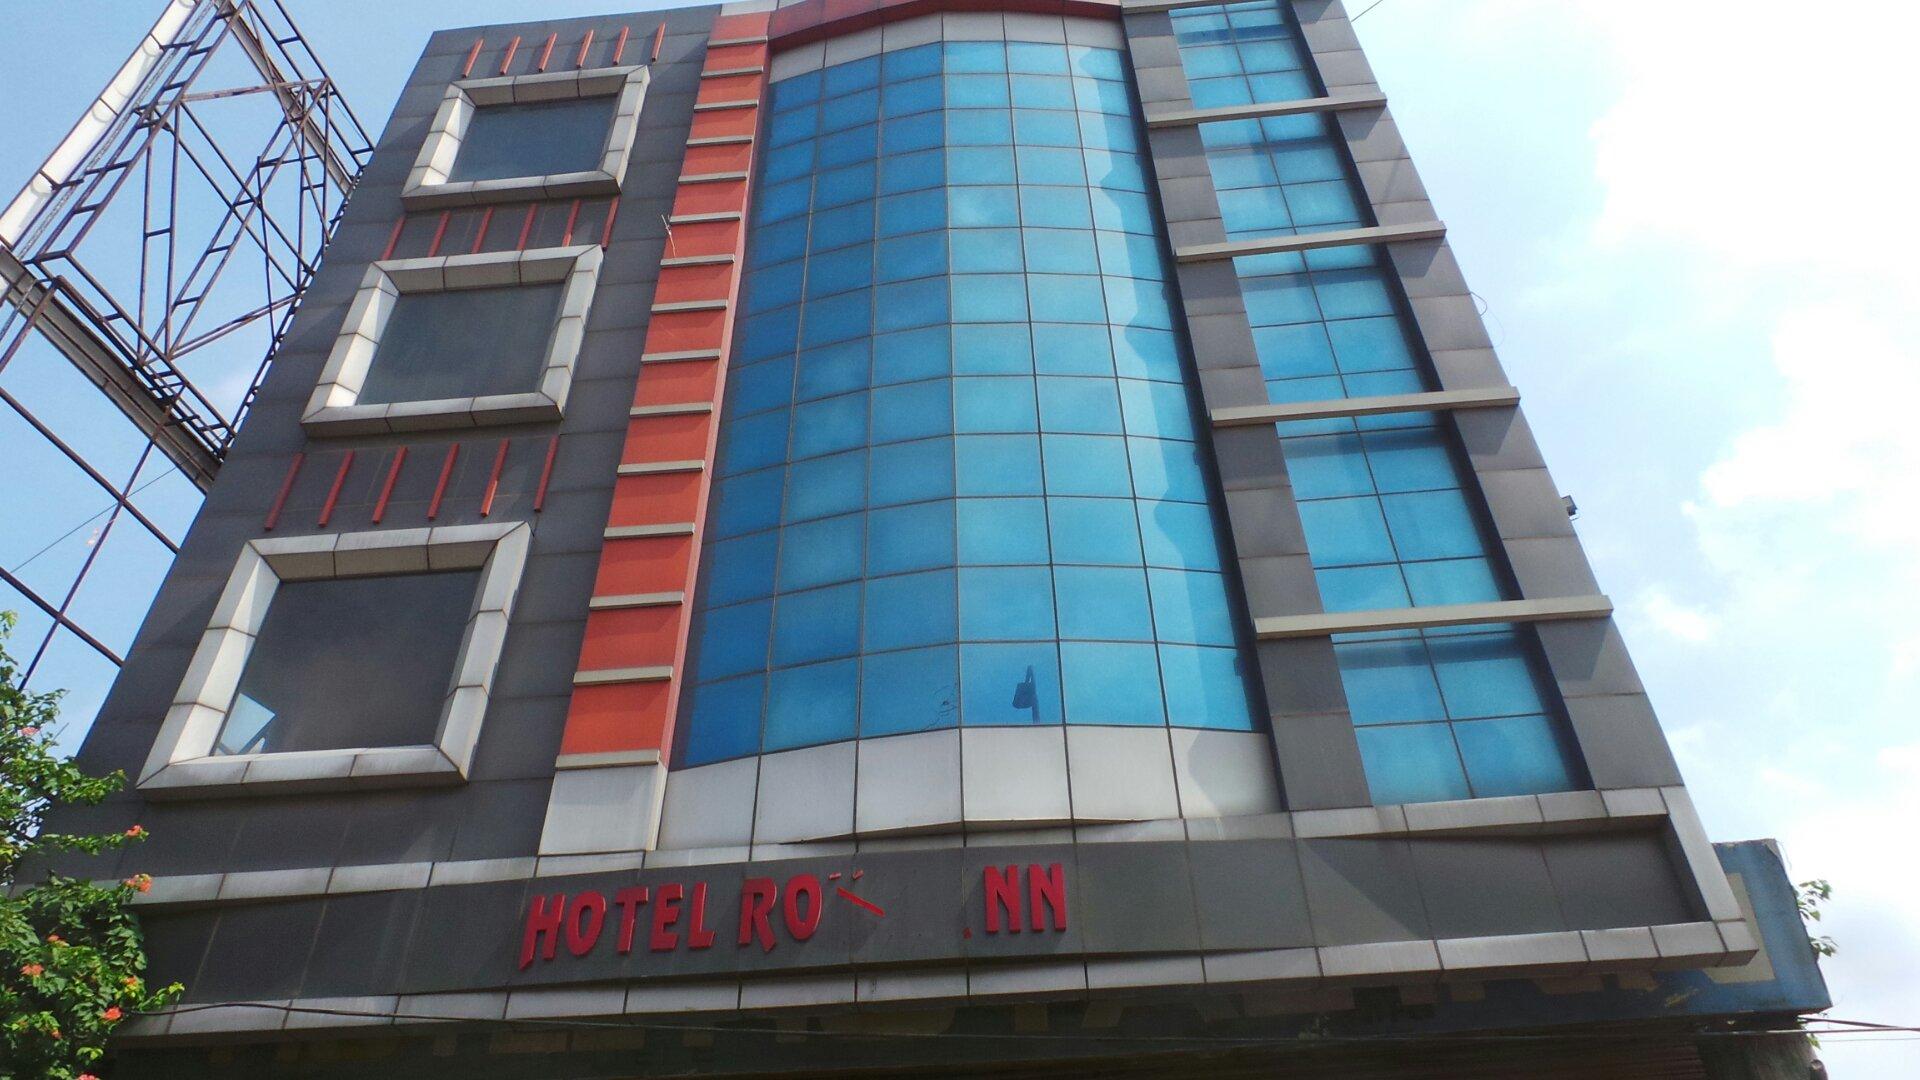 Hotel Royal Inn in Ludhiana